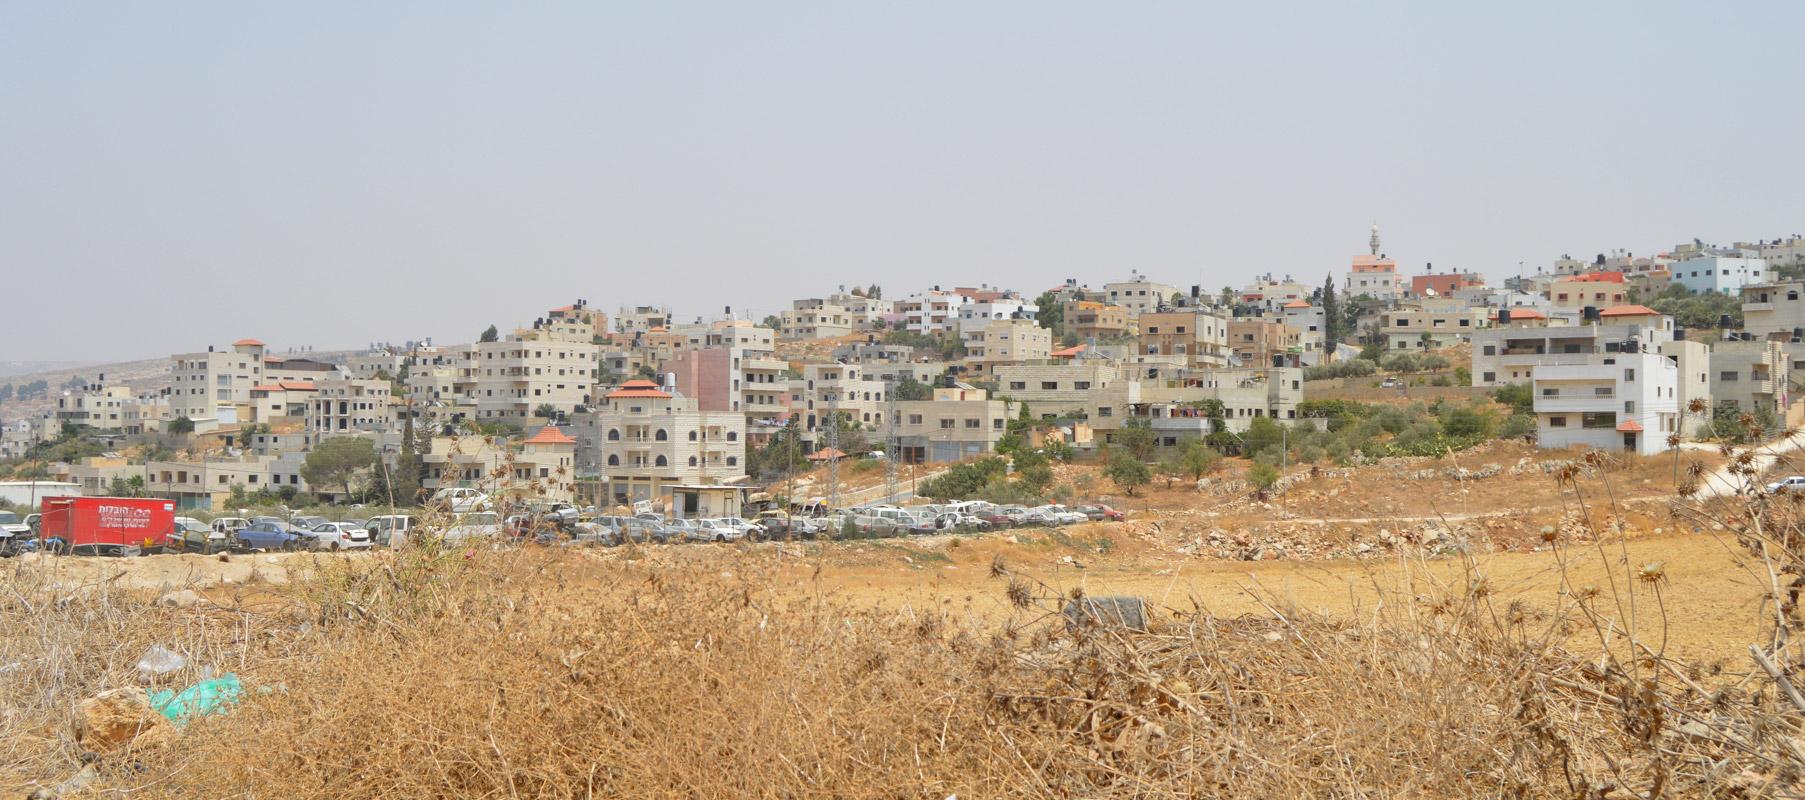 Rujeib, Palestine